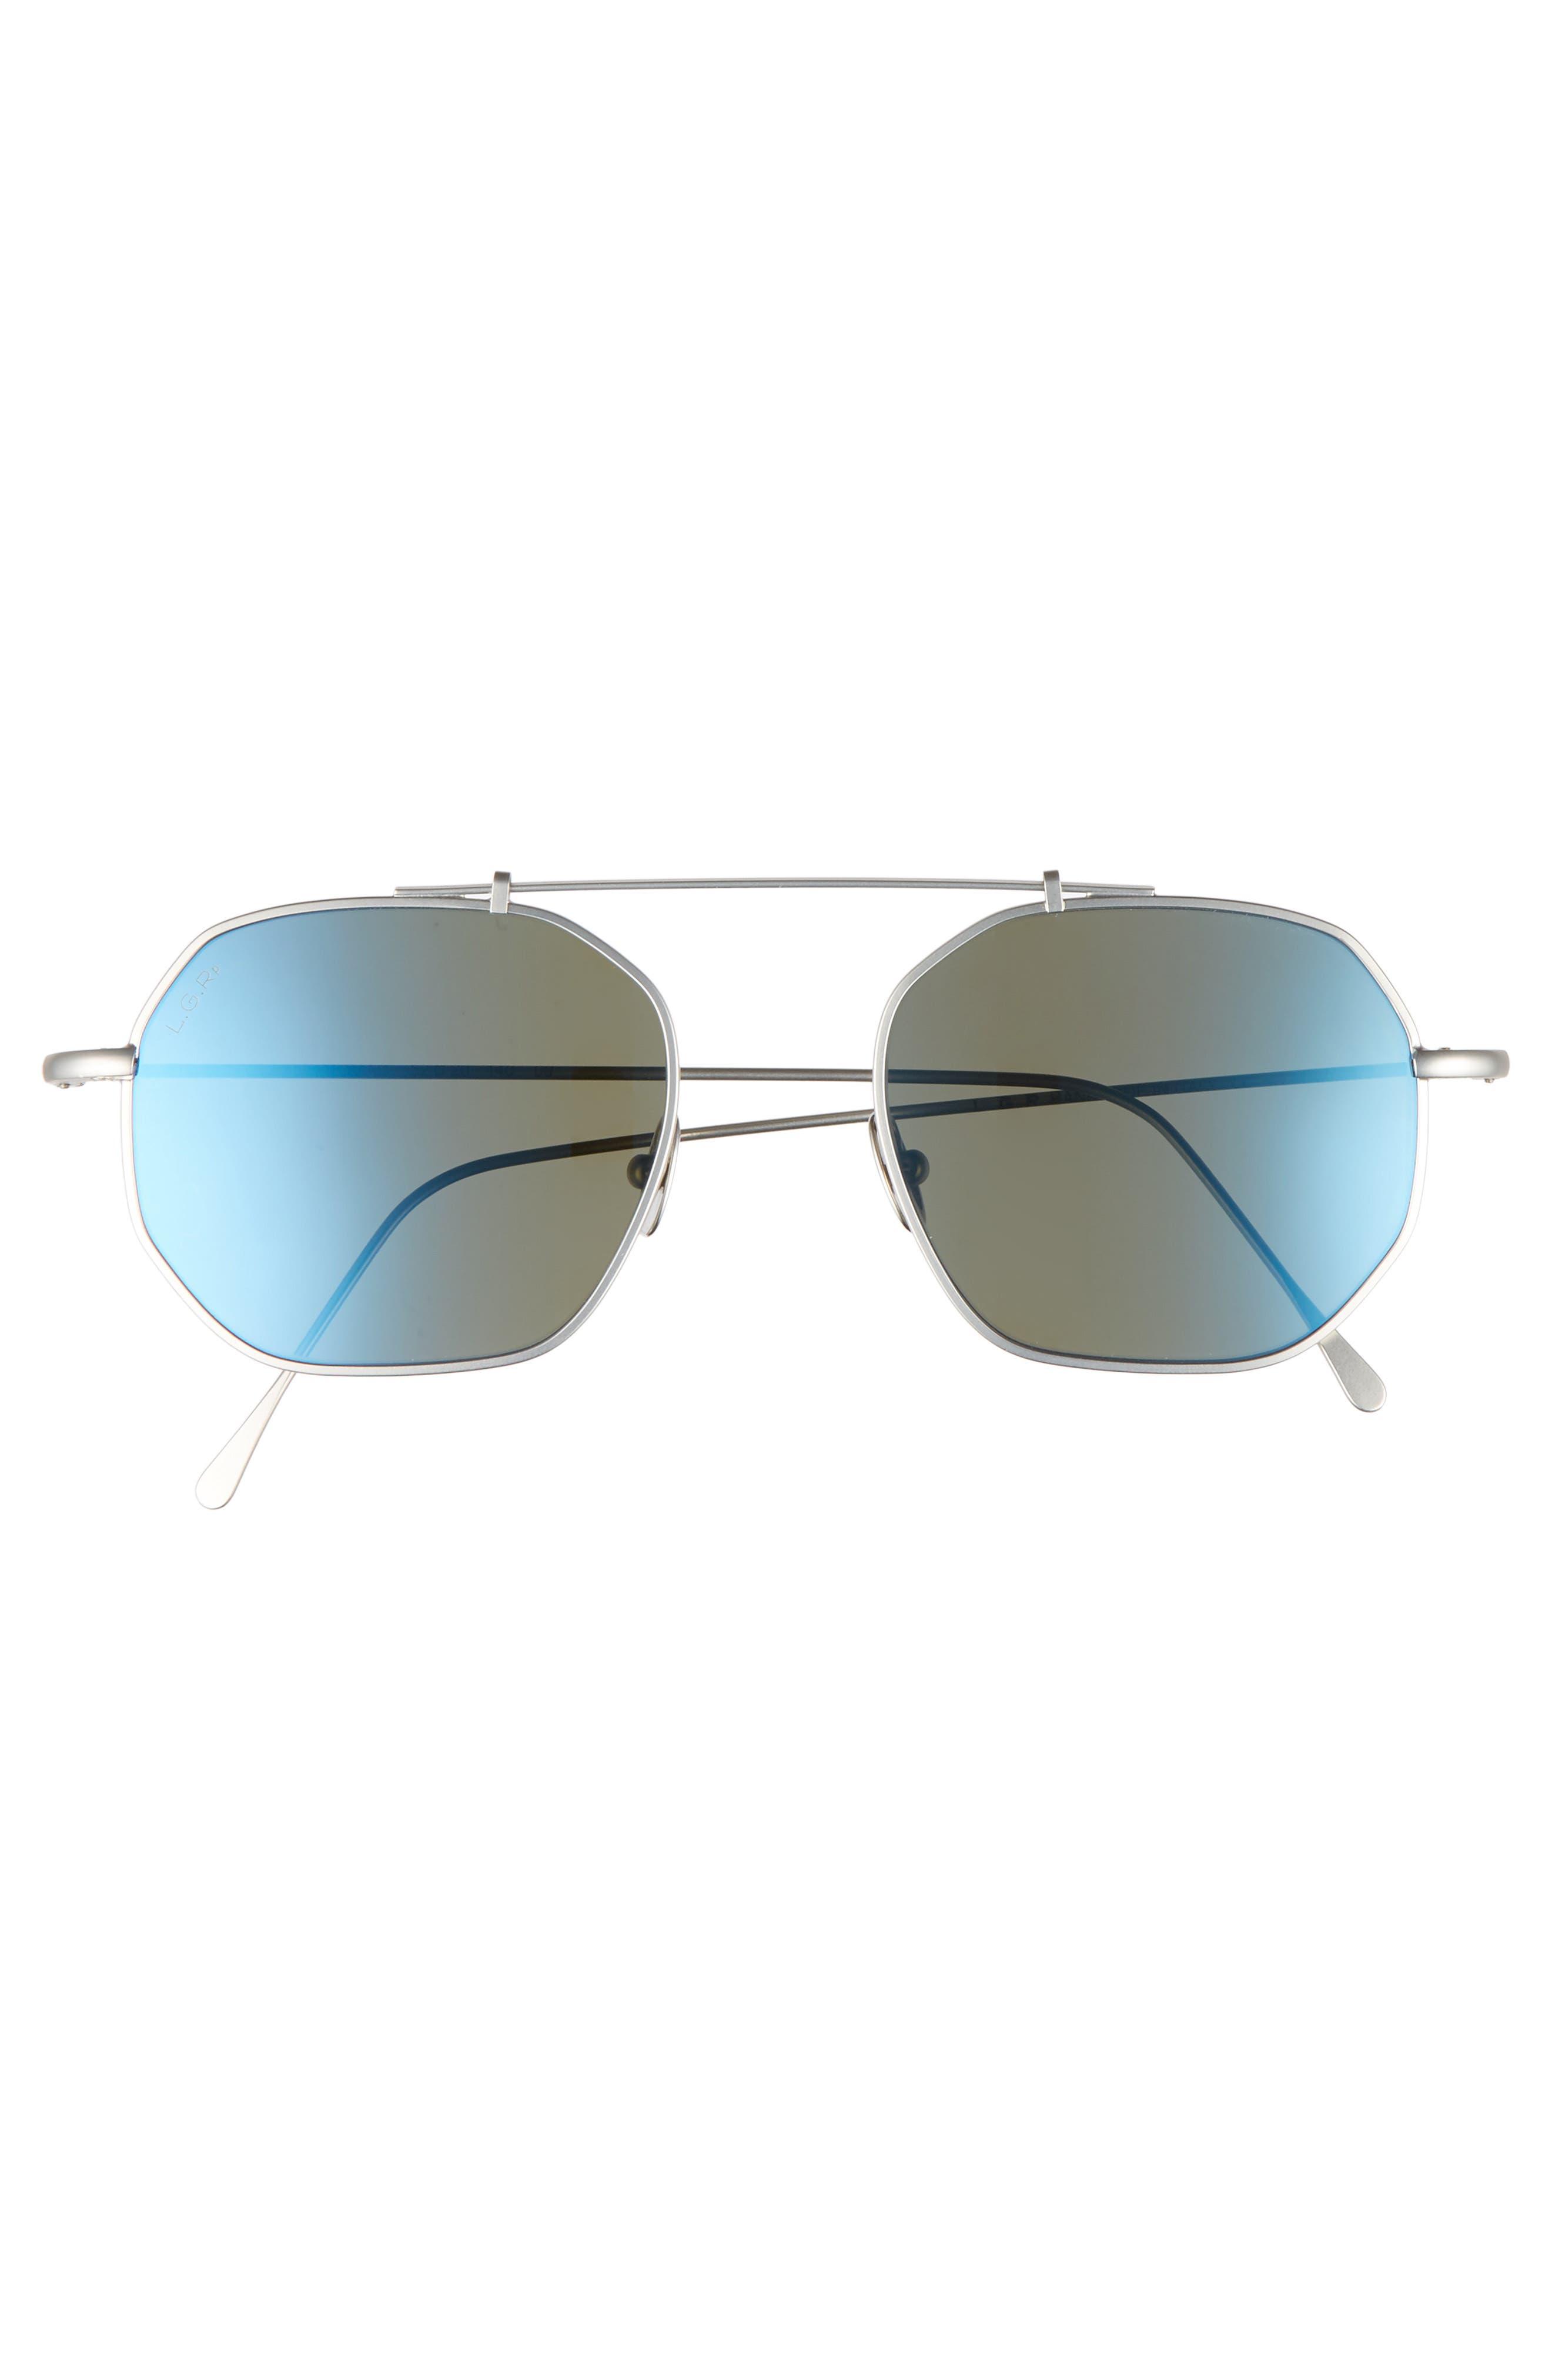 Nomad 52mm Polarized Sunglasses,                             Alternate thumbnail 2, color,                             Silver Matte/ Blue Mirror